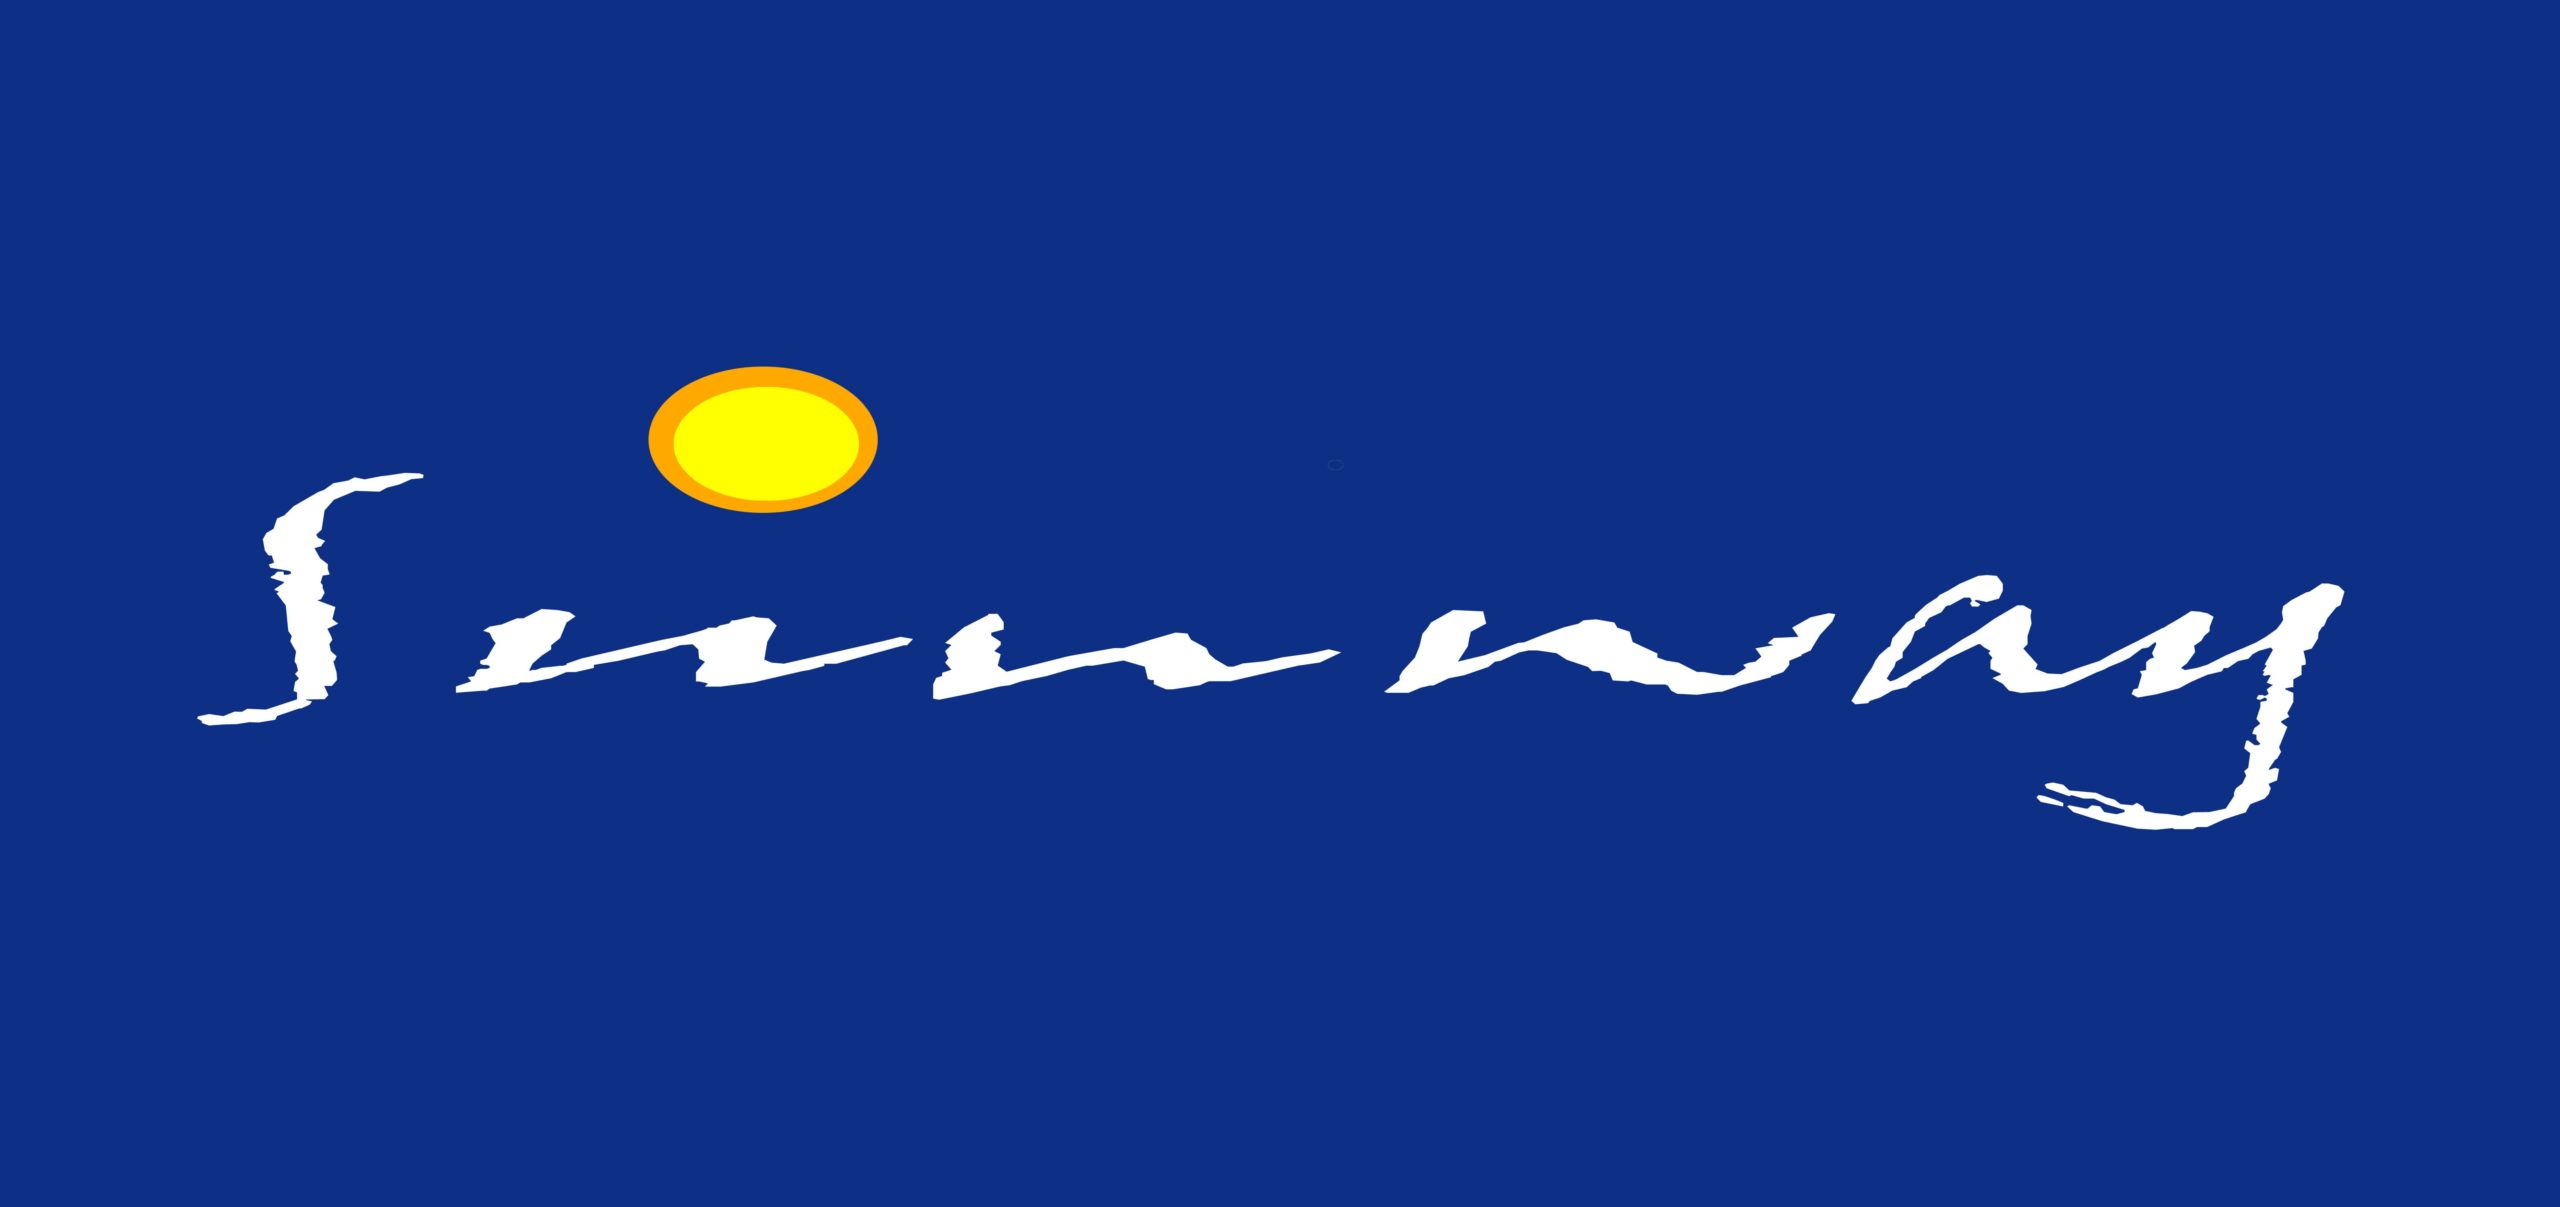 https://clubmarsitges.com/wp-content/uploads/2021/09/logo_sunway_300_dpi_azul-min-scaled.jpg